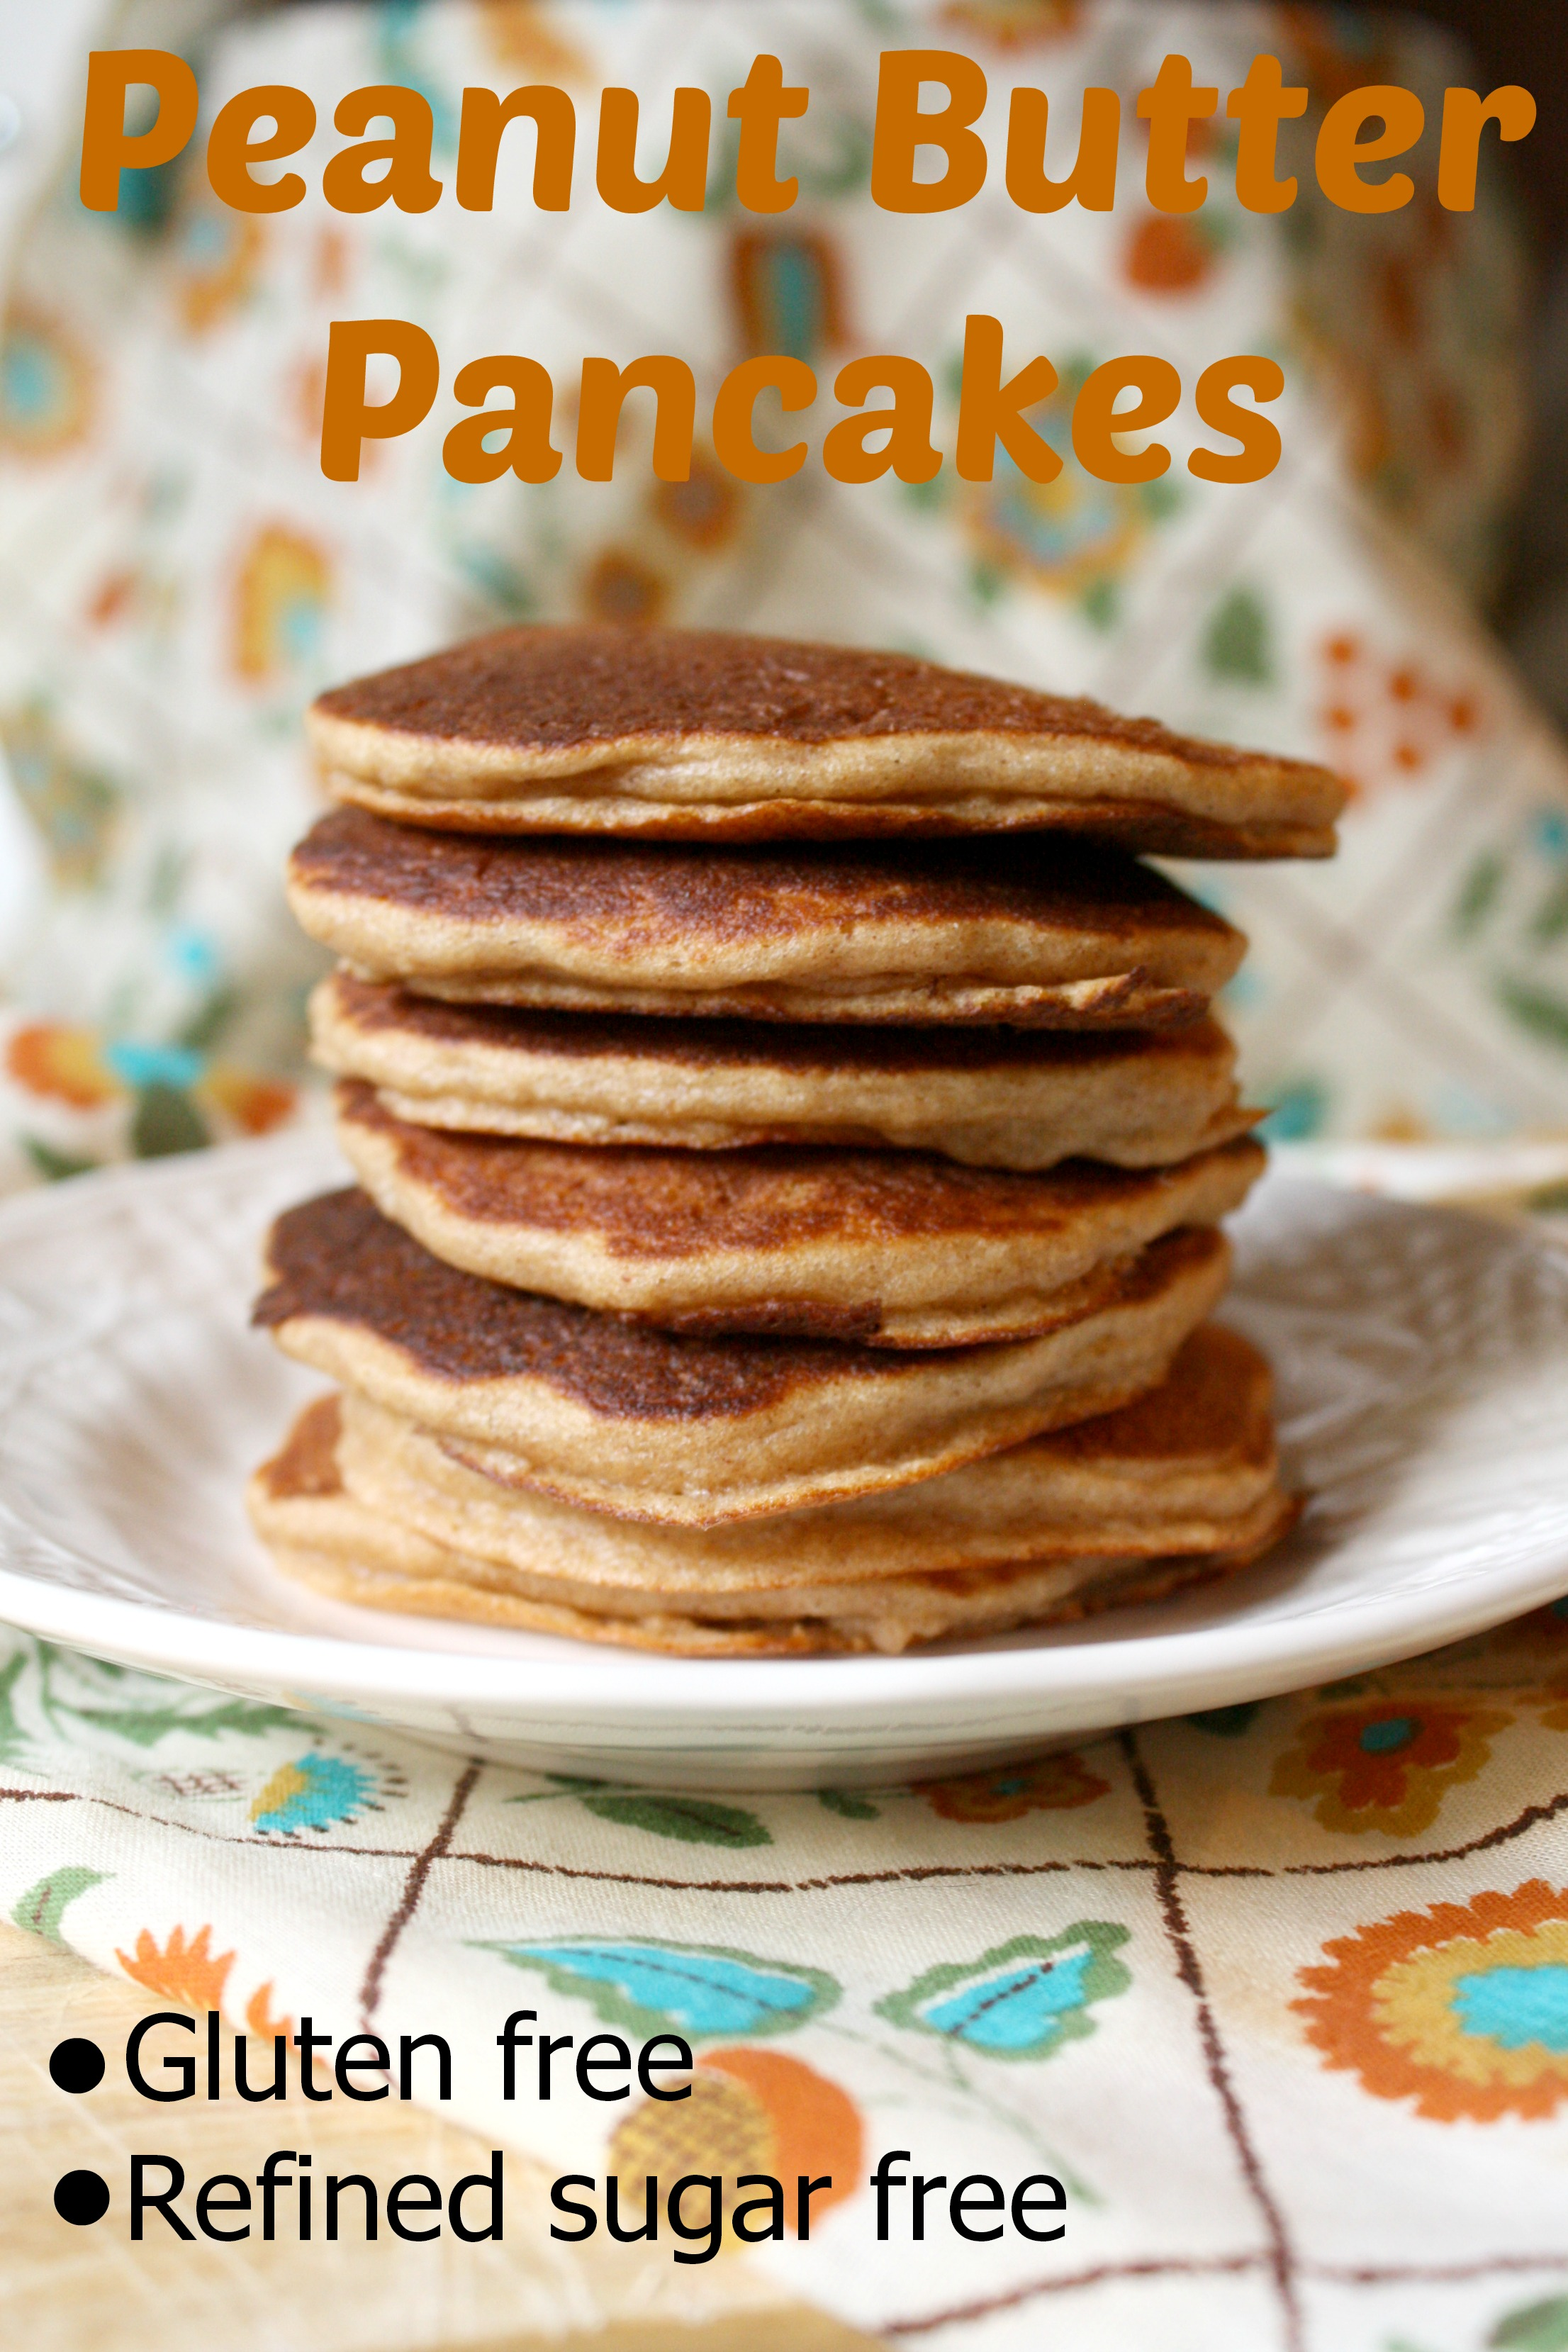 Peanut Butter Pancakes {gluten free}